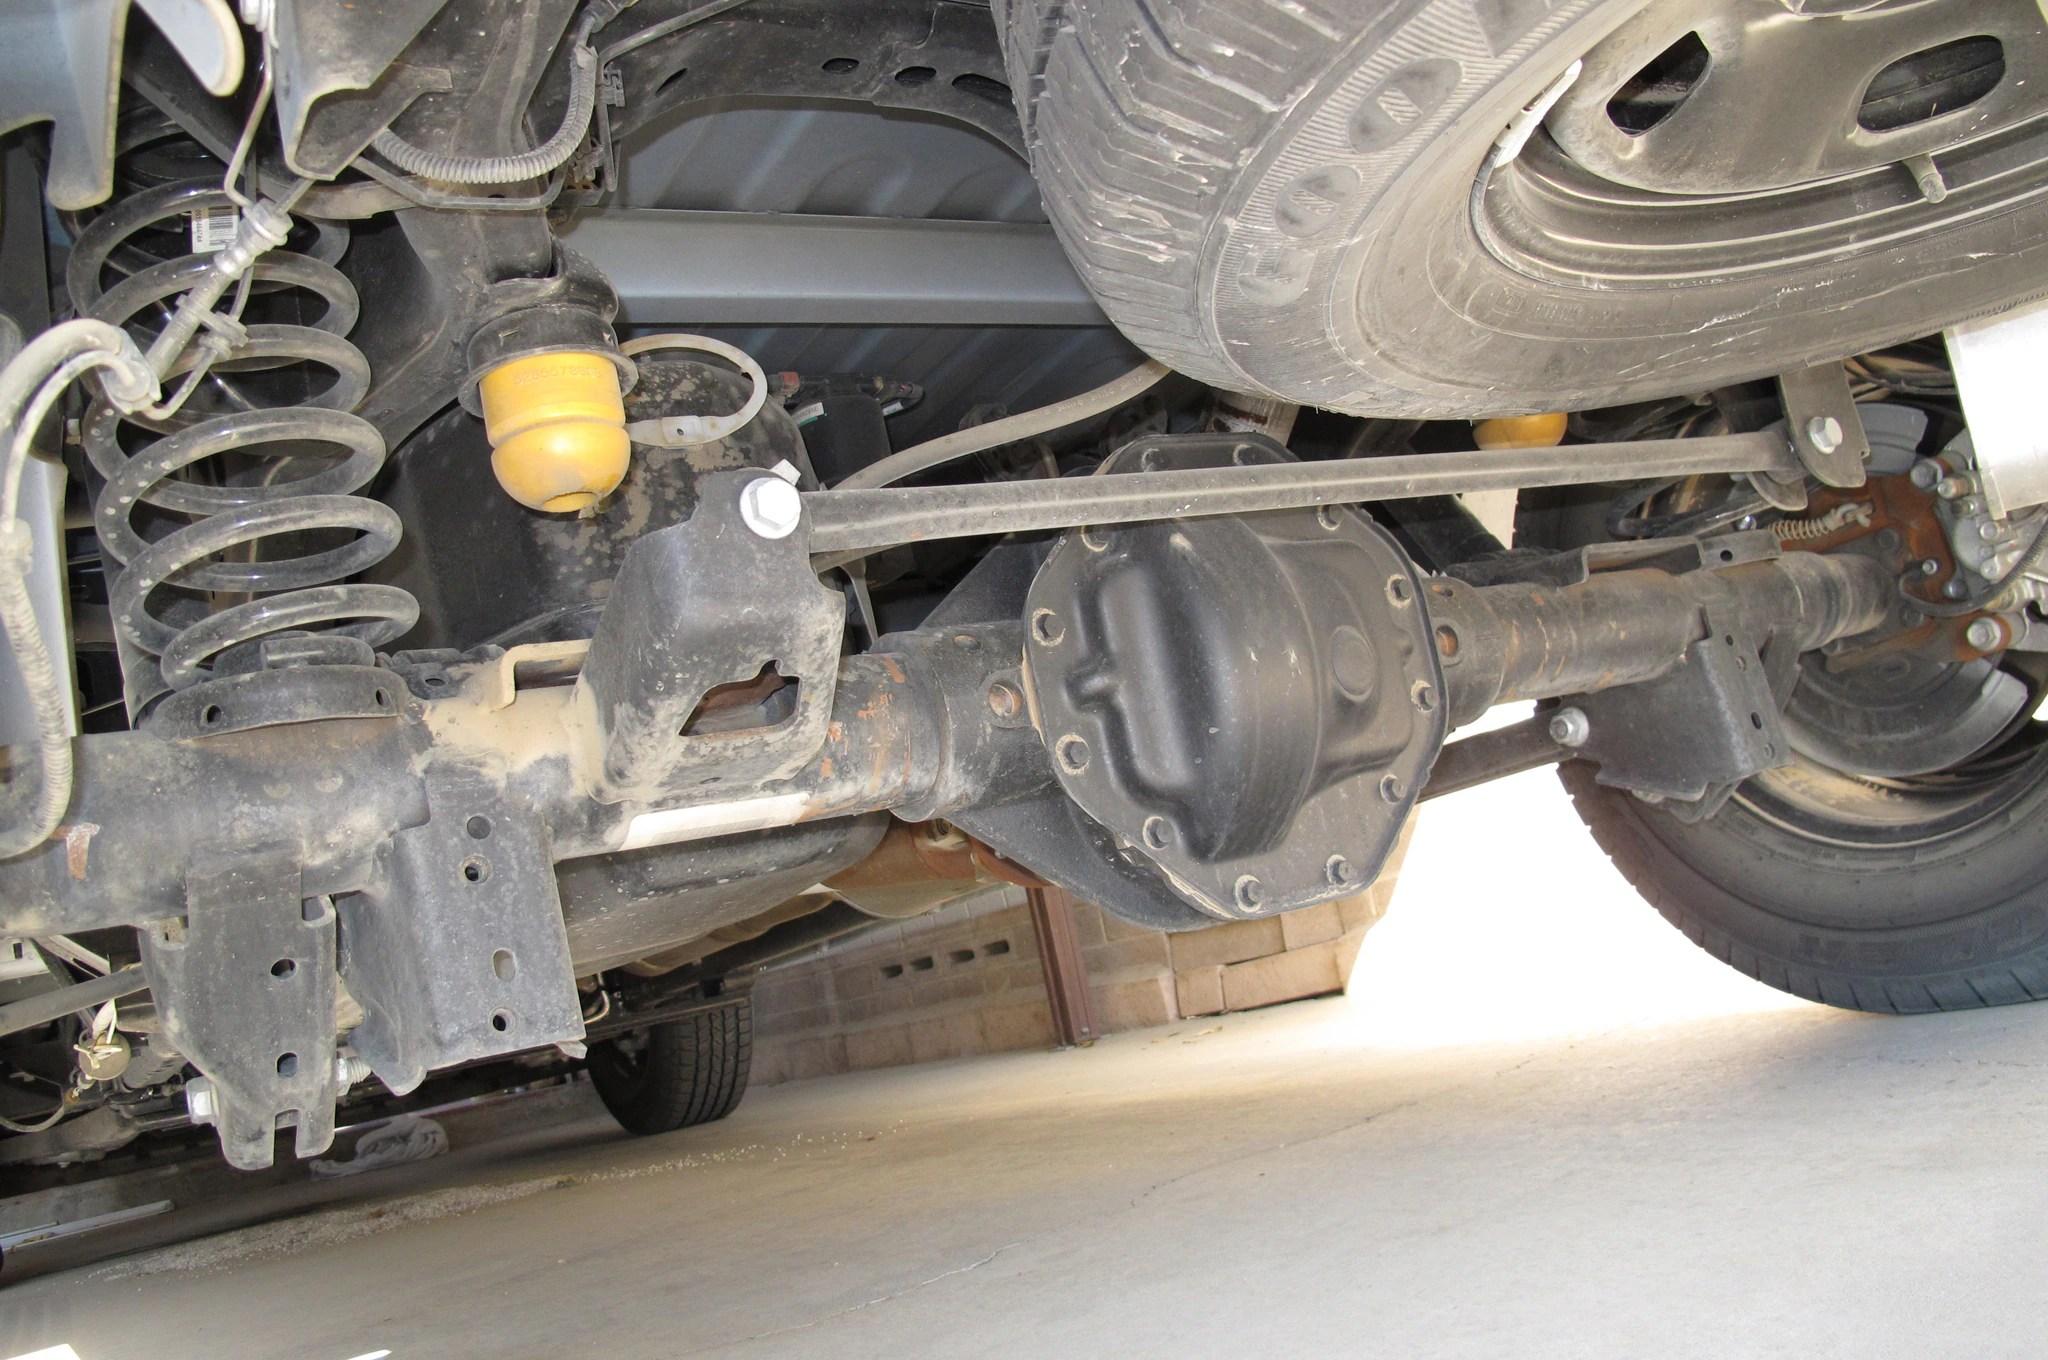 2004 Chevy Silverado 2500 Transmission Wiring Diagrams Ram 1500 Ecodiesel Tradesman Cabina Regular 2014 Primer